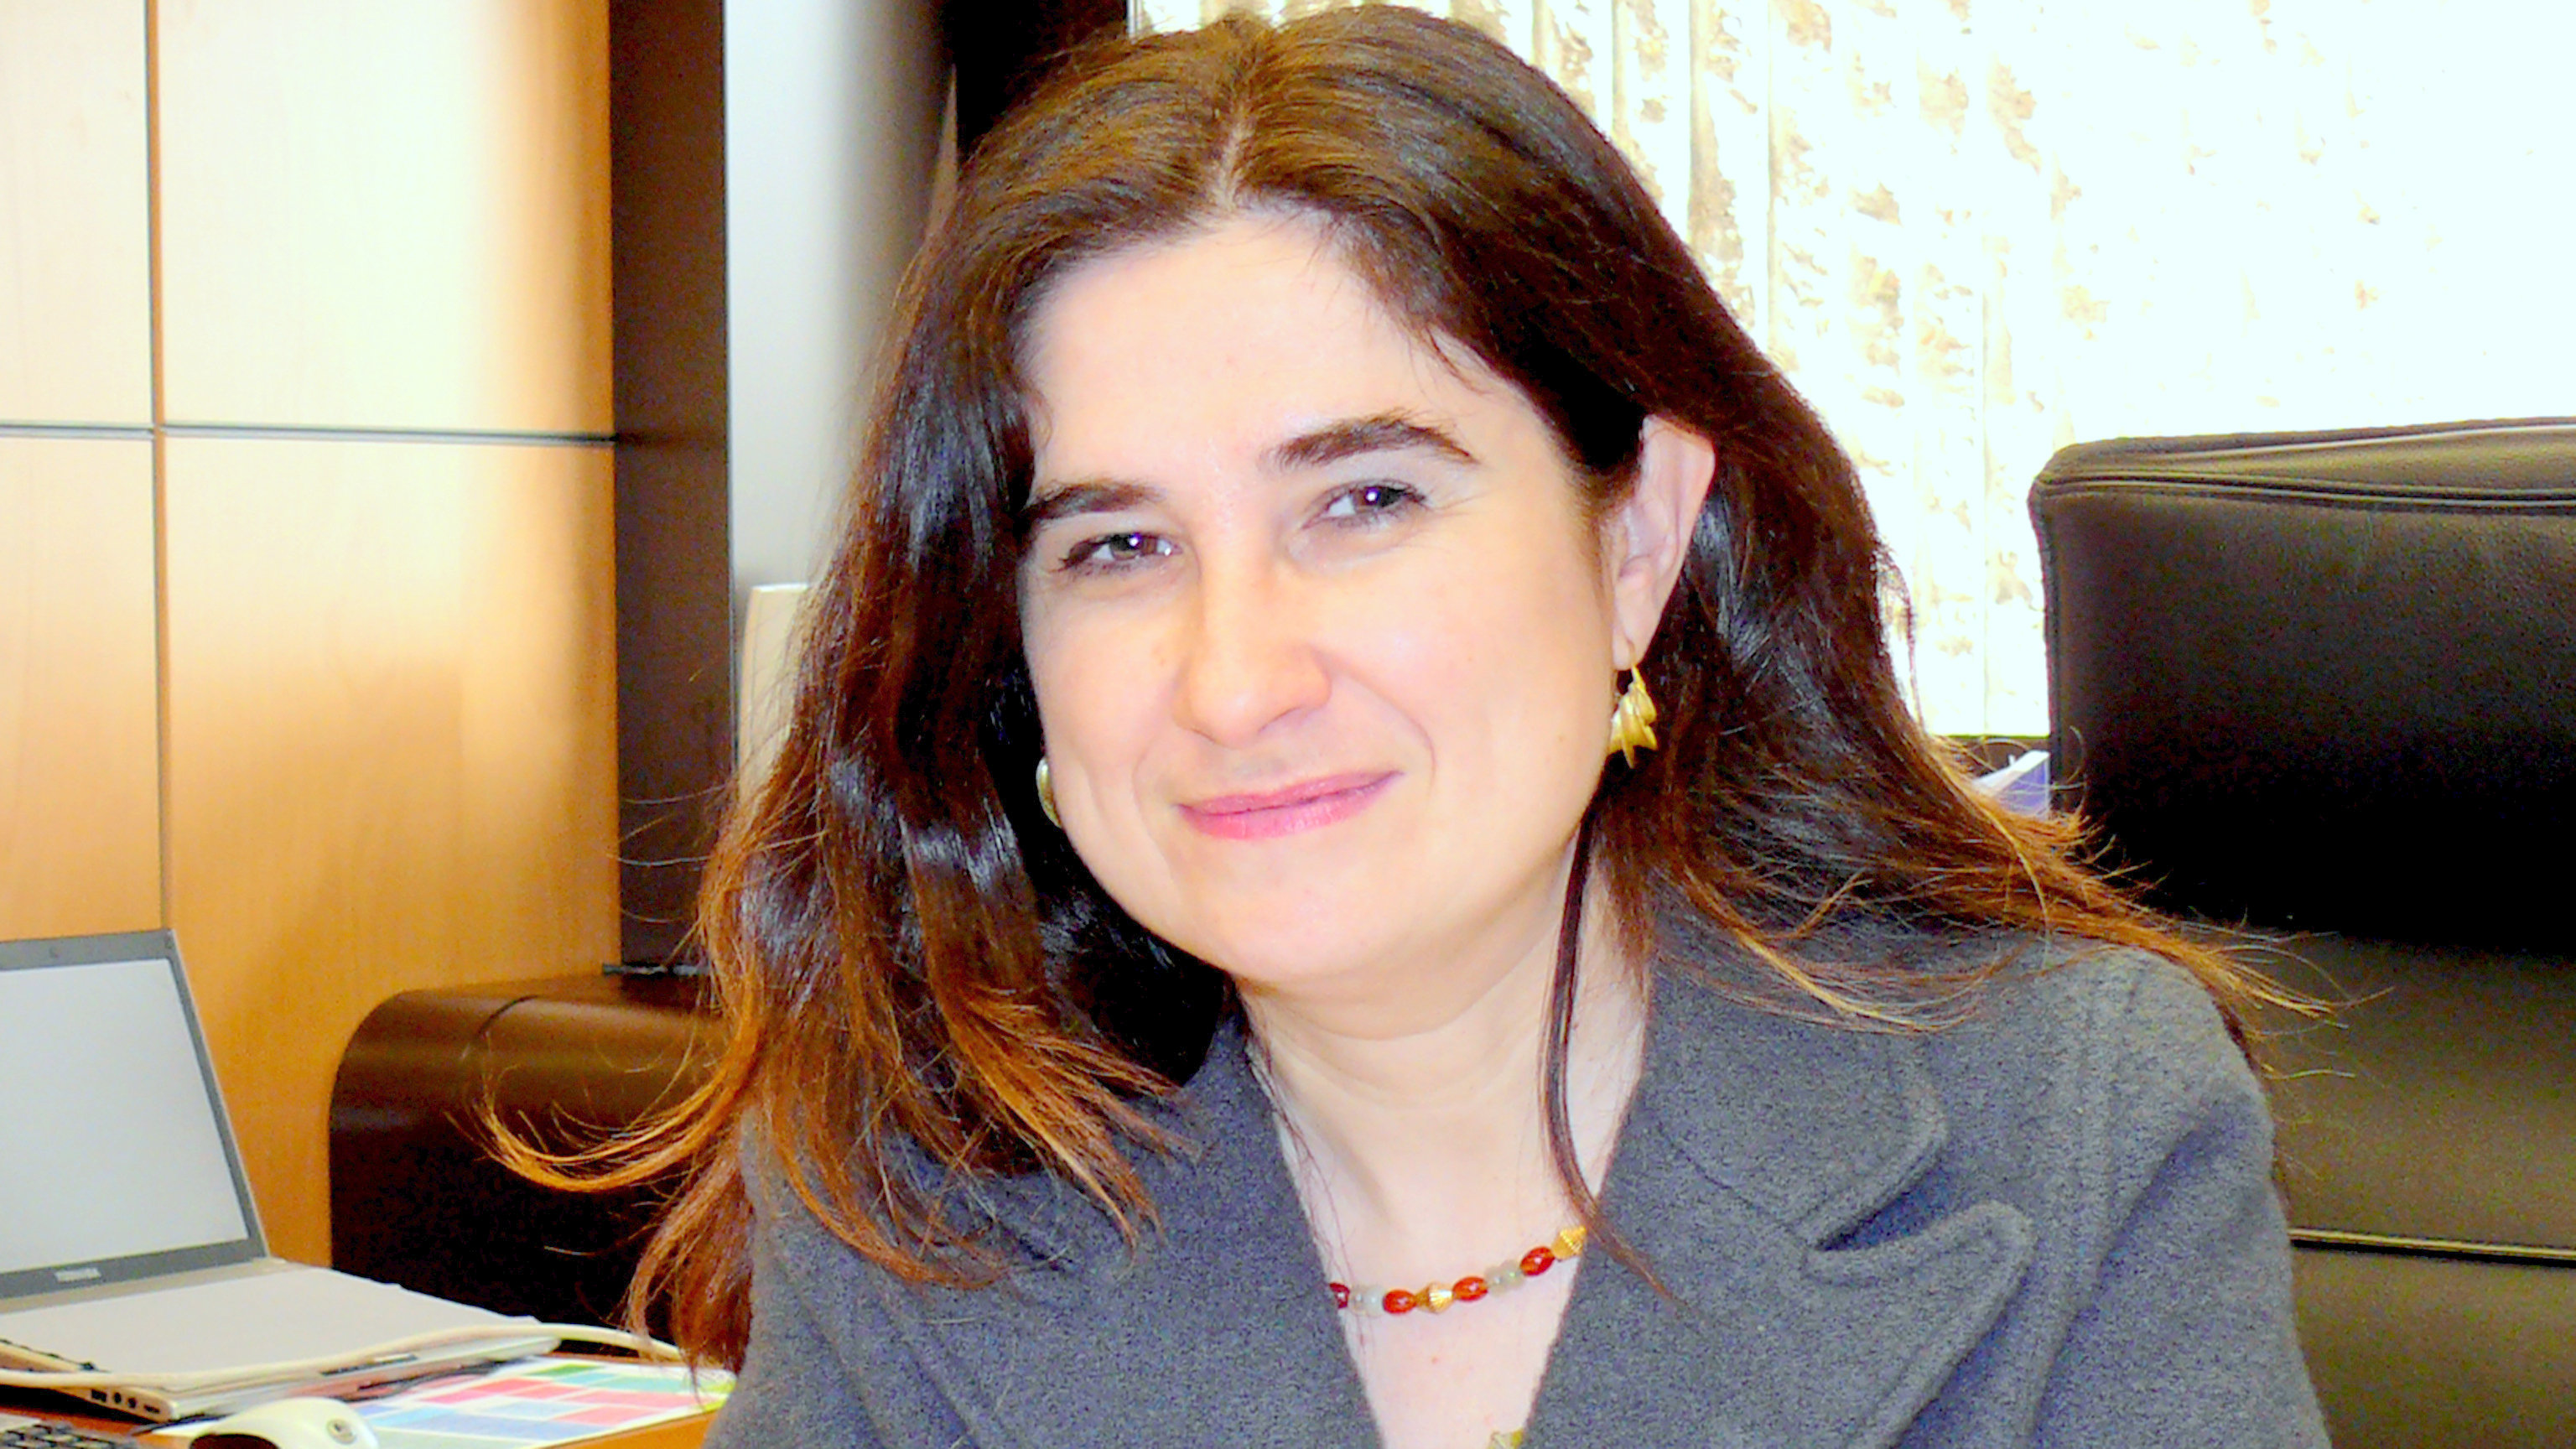 Ines Sanchez de Madariaga